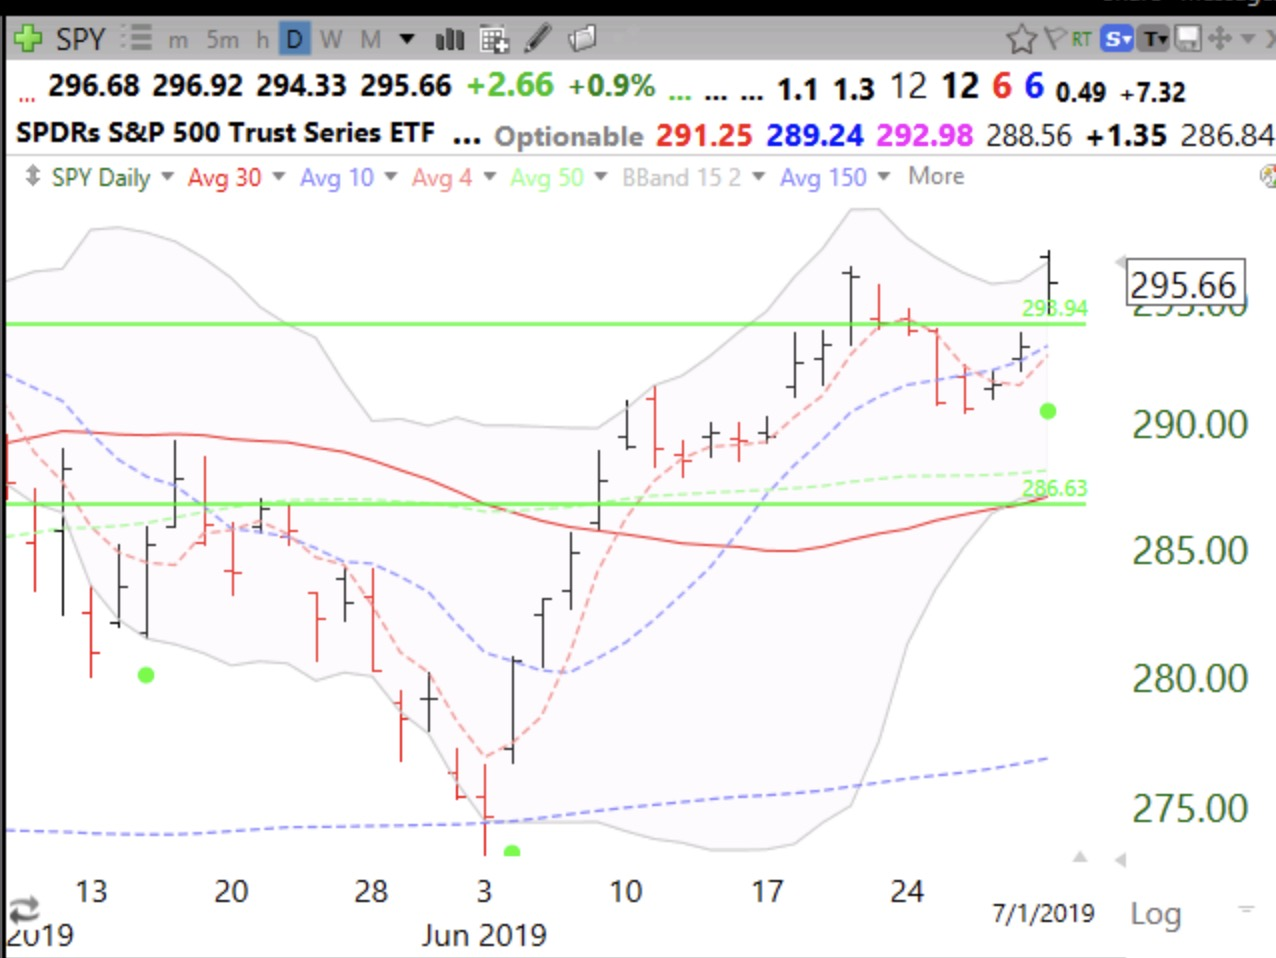 SPY and $QQQ each have green dot signal